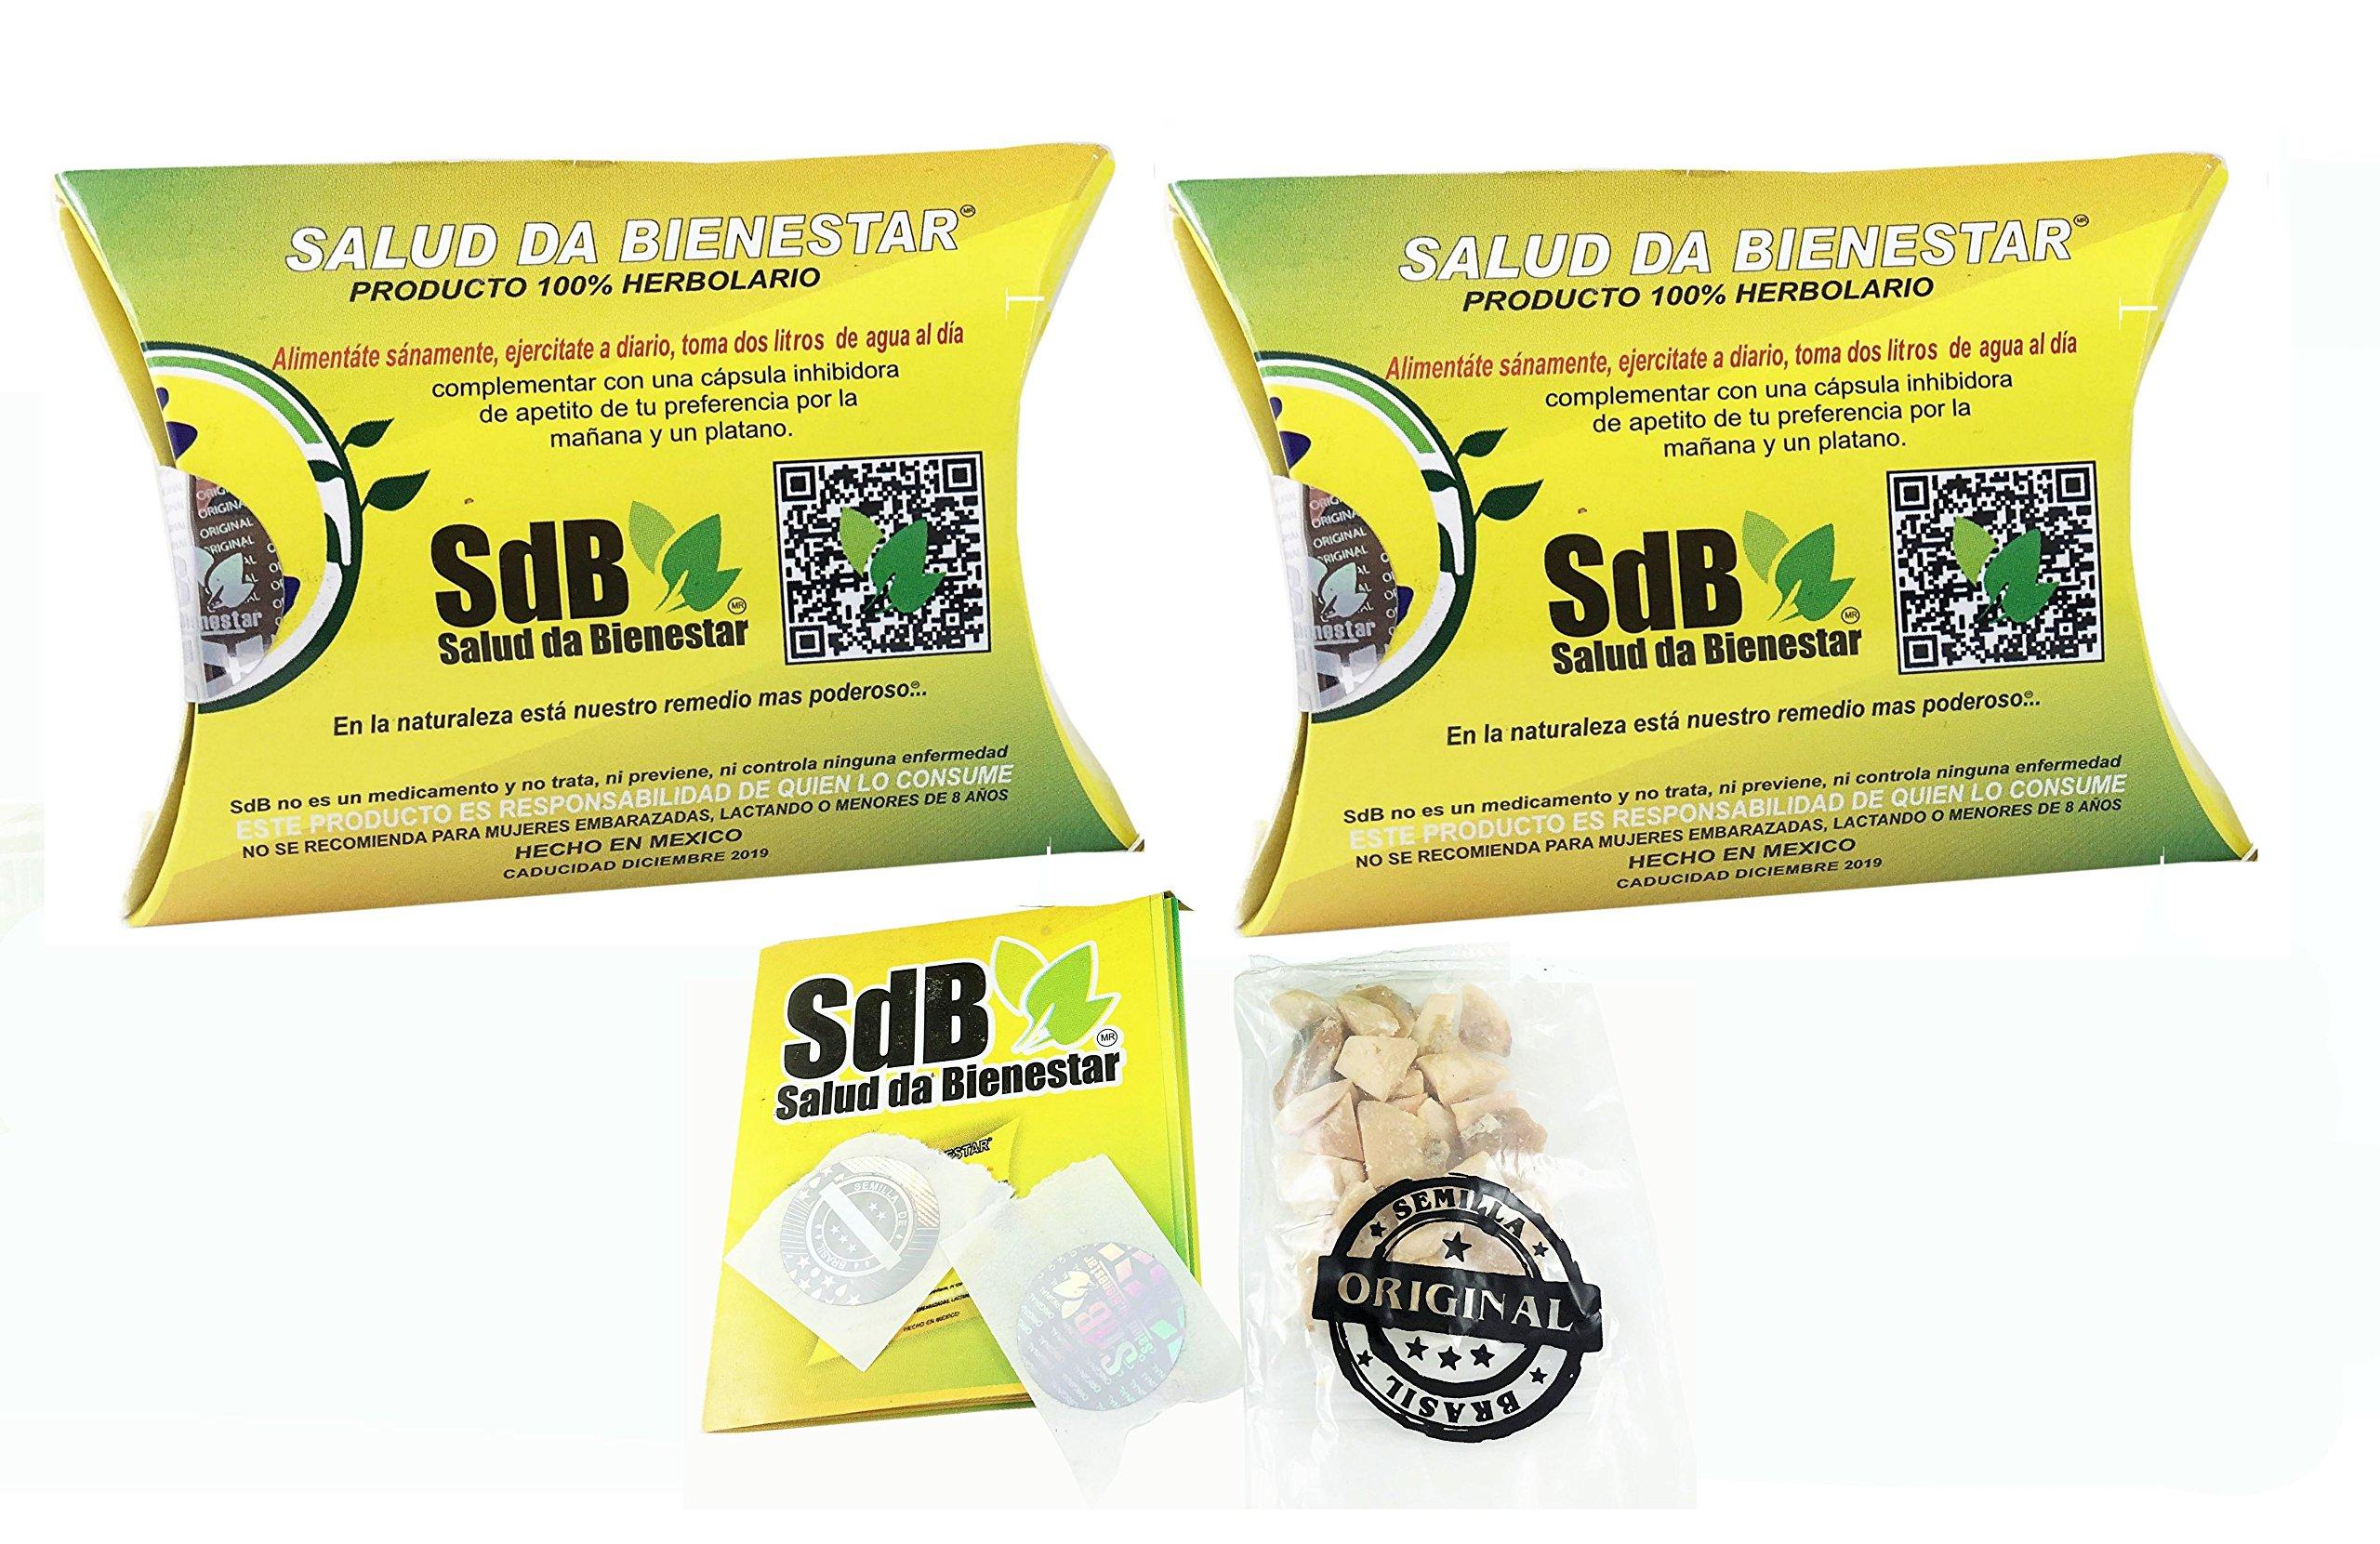 2 PACK Semilla de Brasil Brazil Seed Supplement for 6 Months of Use 100% Authentic Brasil Seed All Natural Supplement Pure Brazilian Nut la original para adelgazar de SdB Salud da Bienestar - 2 Month by SDB Salud da Bienestar